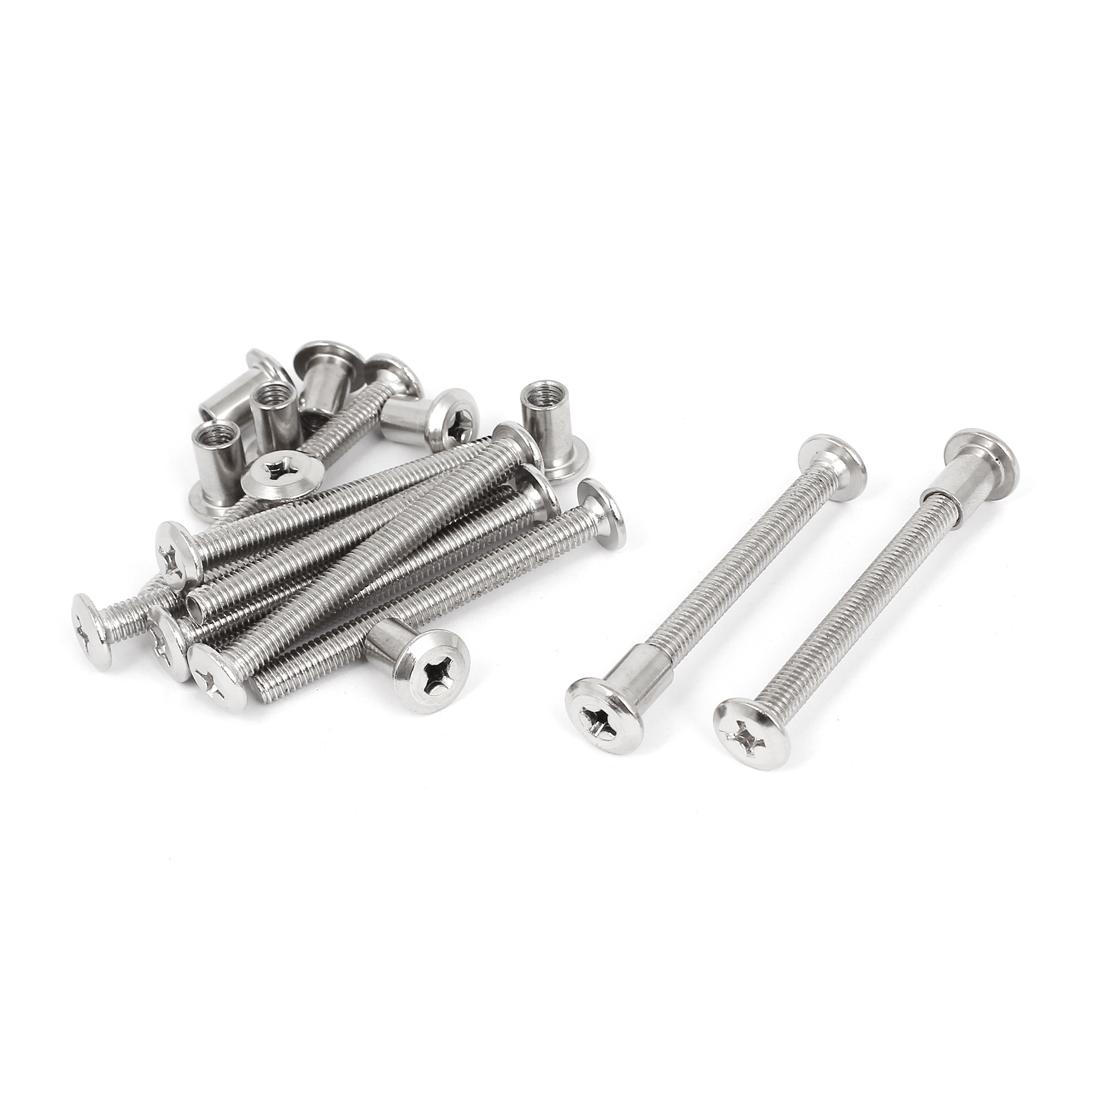 10 Sets 6mmx60mm Phillips Socket Countersunk Head Screw Bolts Dowel Barrel Nuts